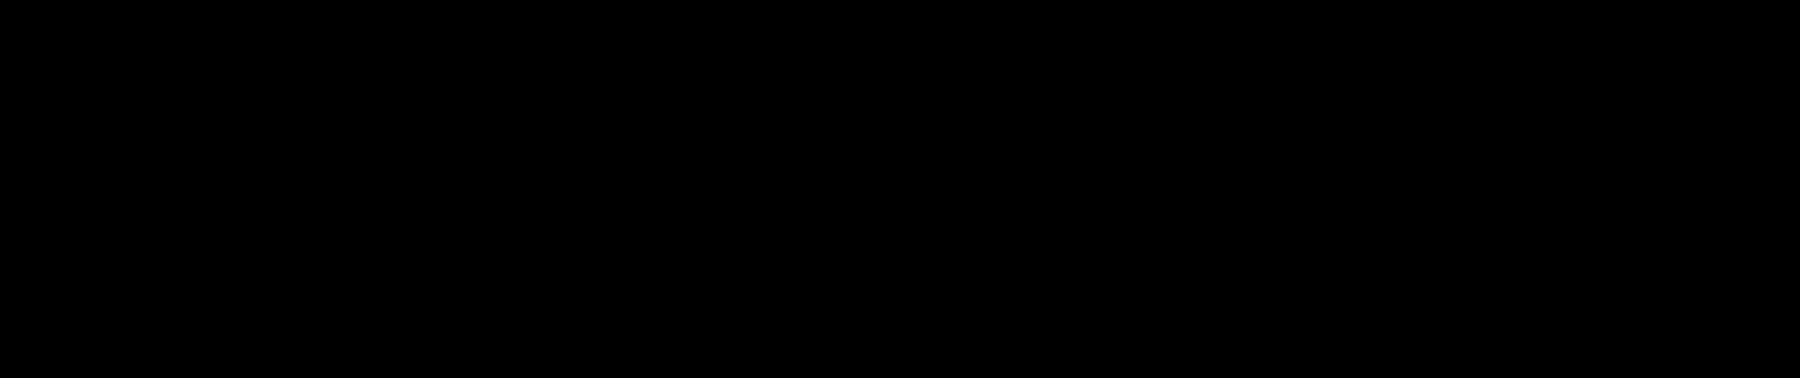 2560px-bmlv_at_logo-black